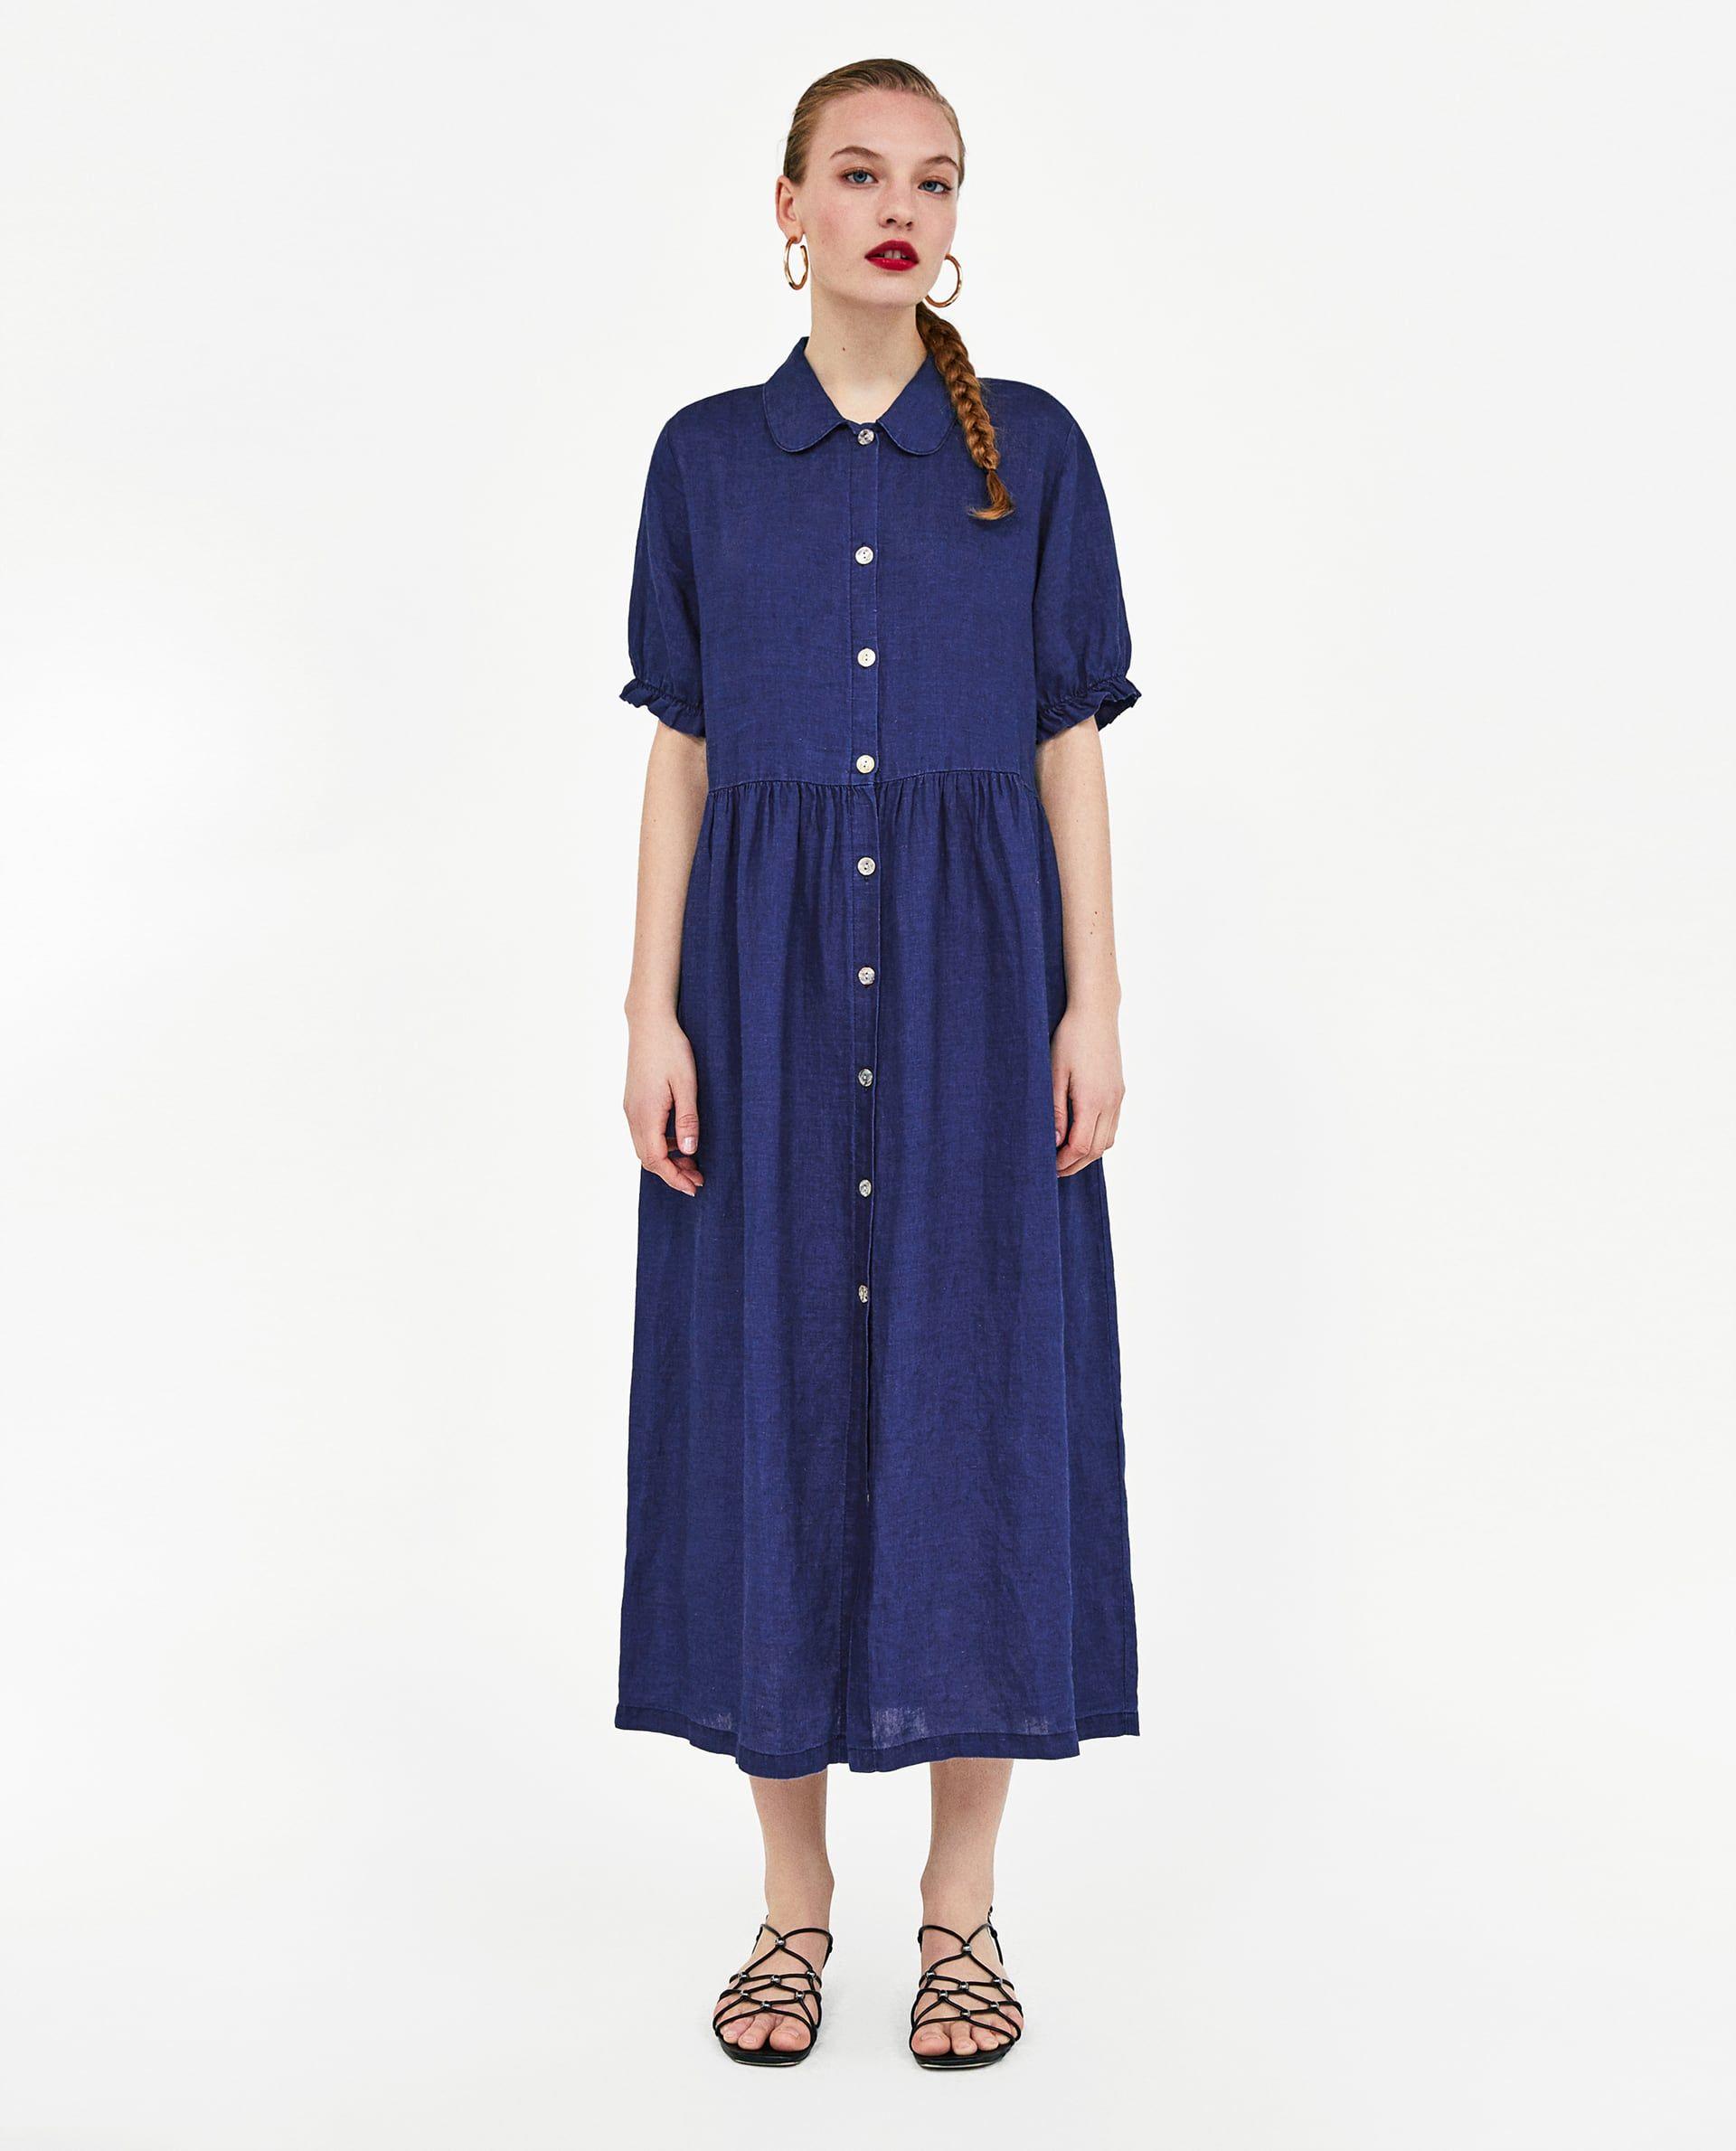 3e74eb1e VESTIDO LARGO LINO | Things to Wear | Linen dresses, Oversized ...